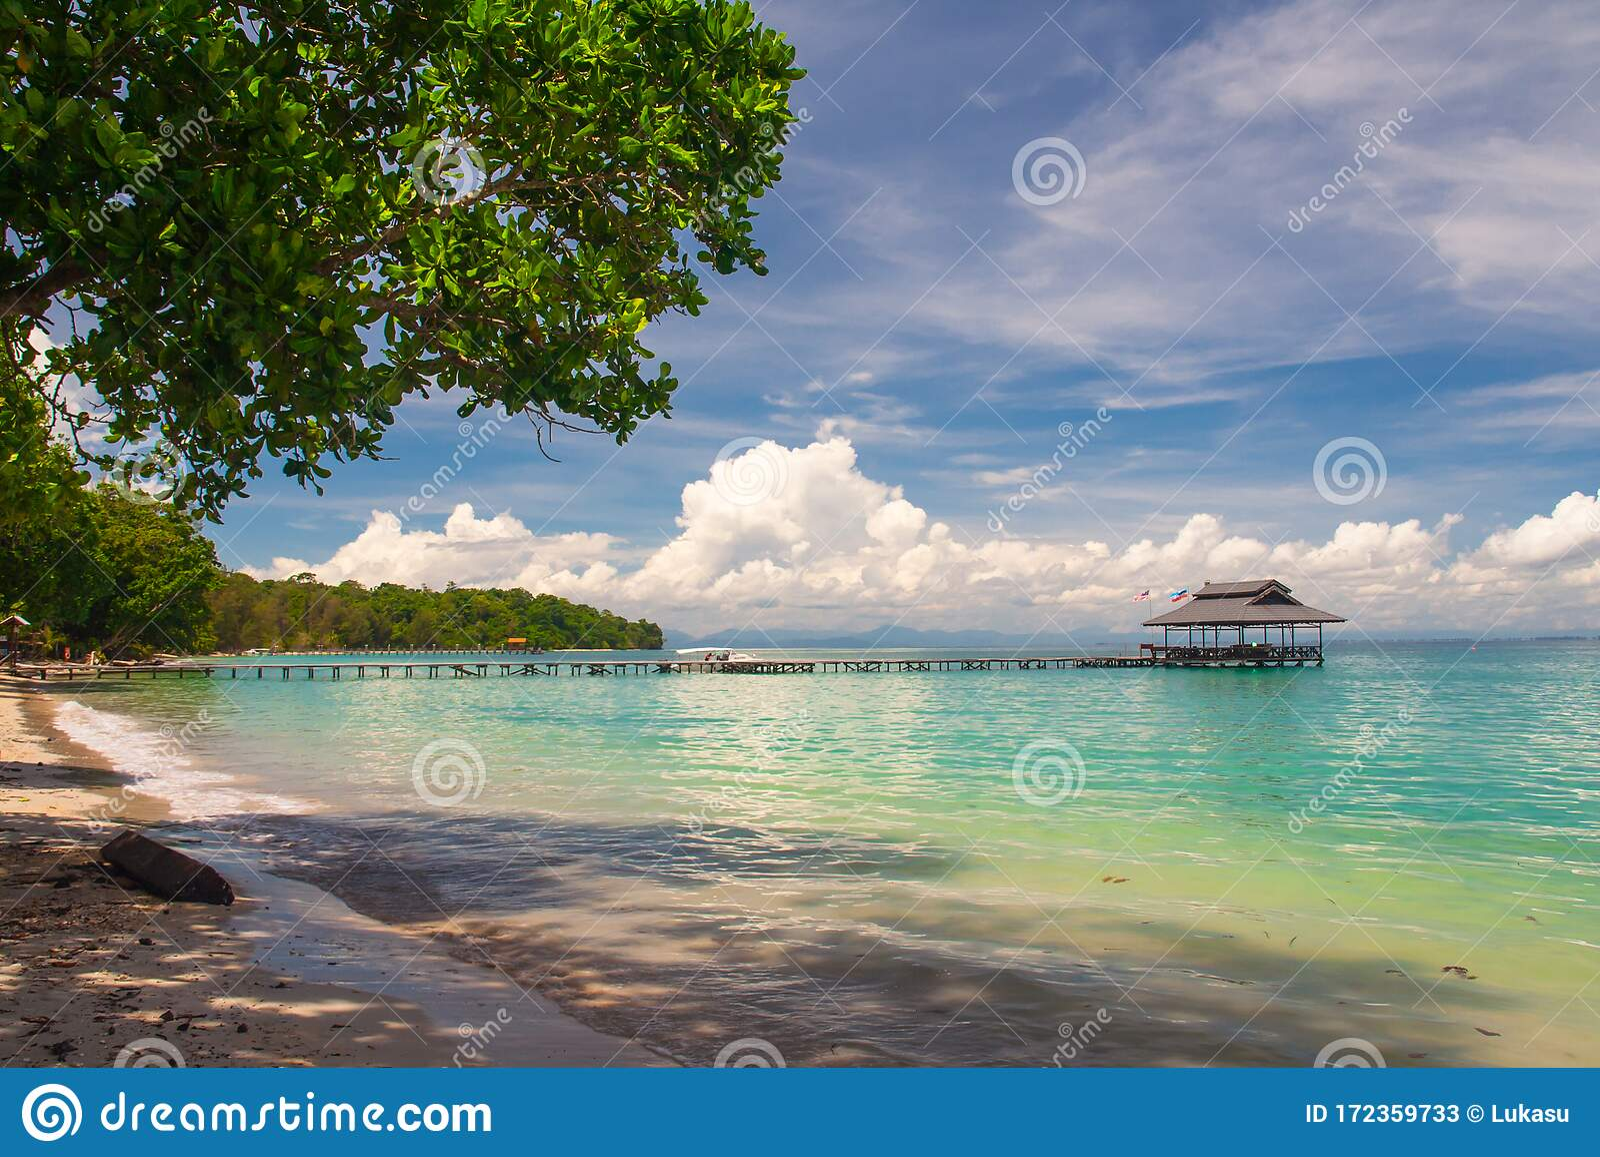 Living My Survivor Superfan Dream Of Visiting Pulau Tiga